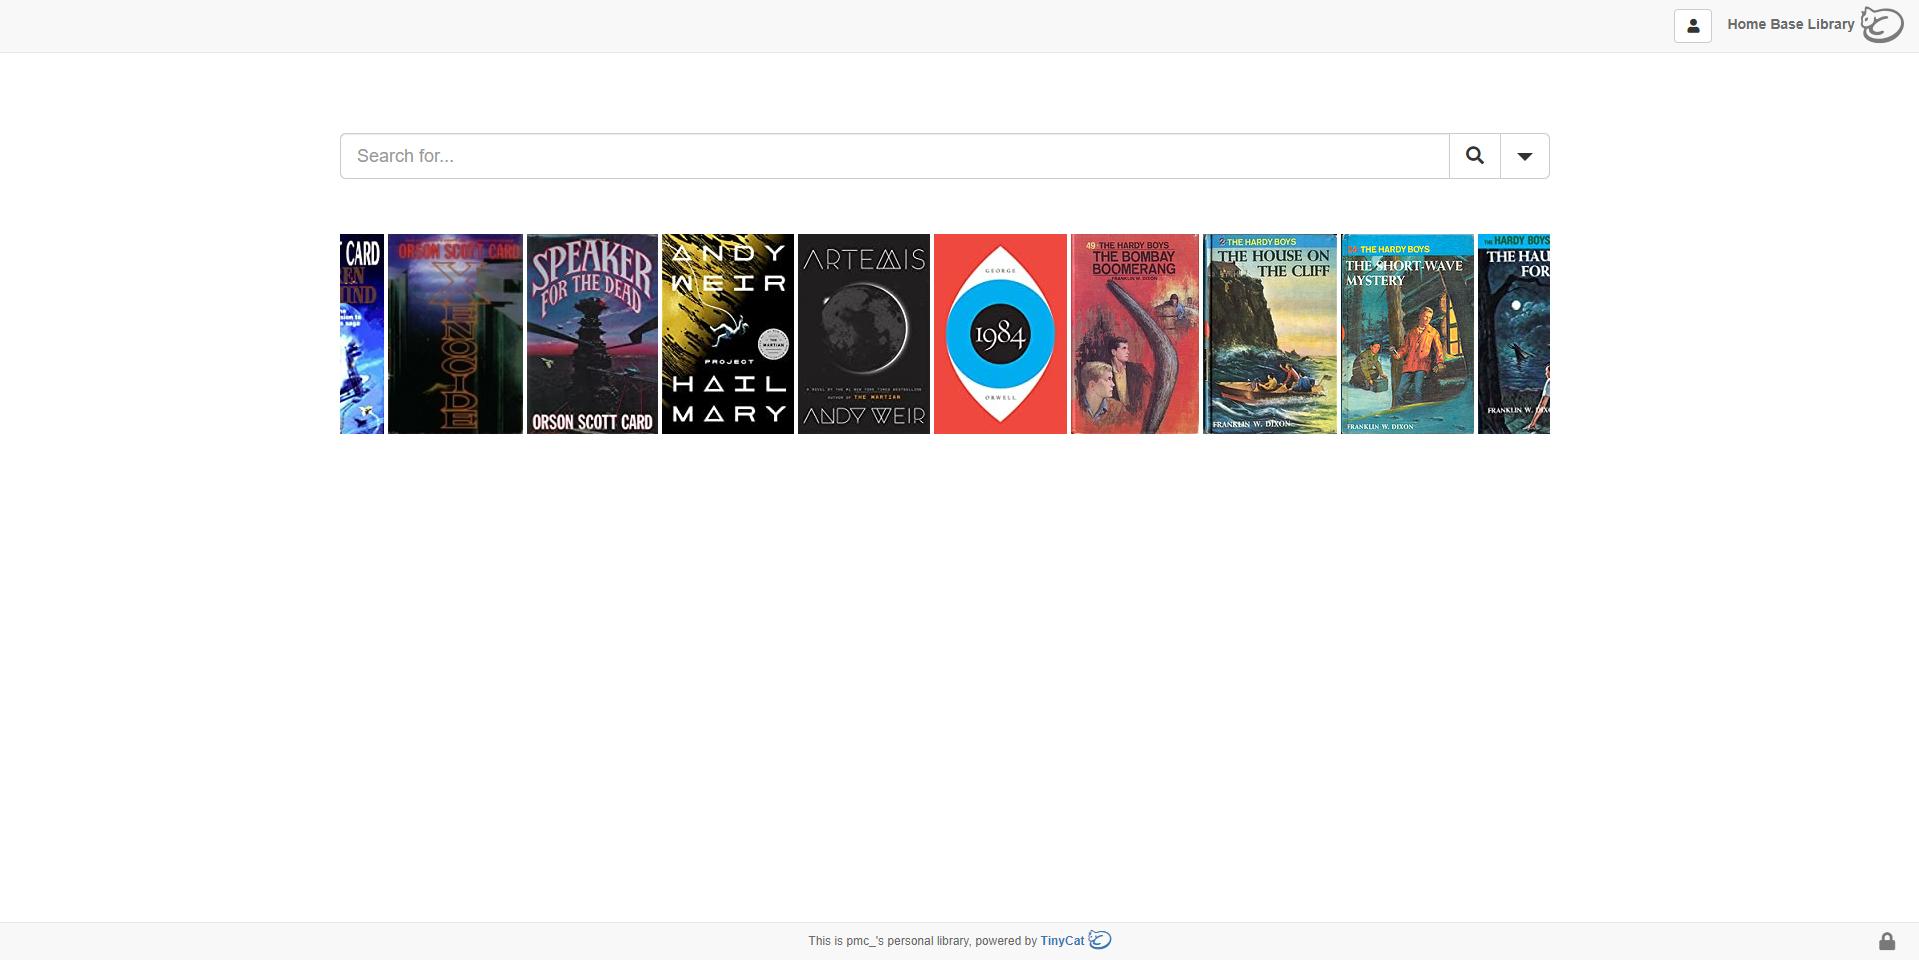 A screenshot of librarycat.org/lib/pmc_